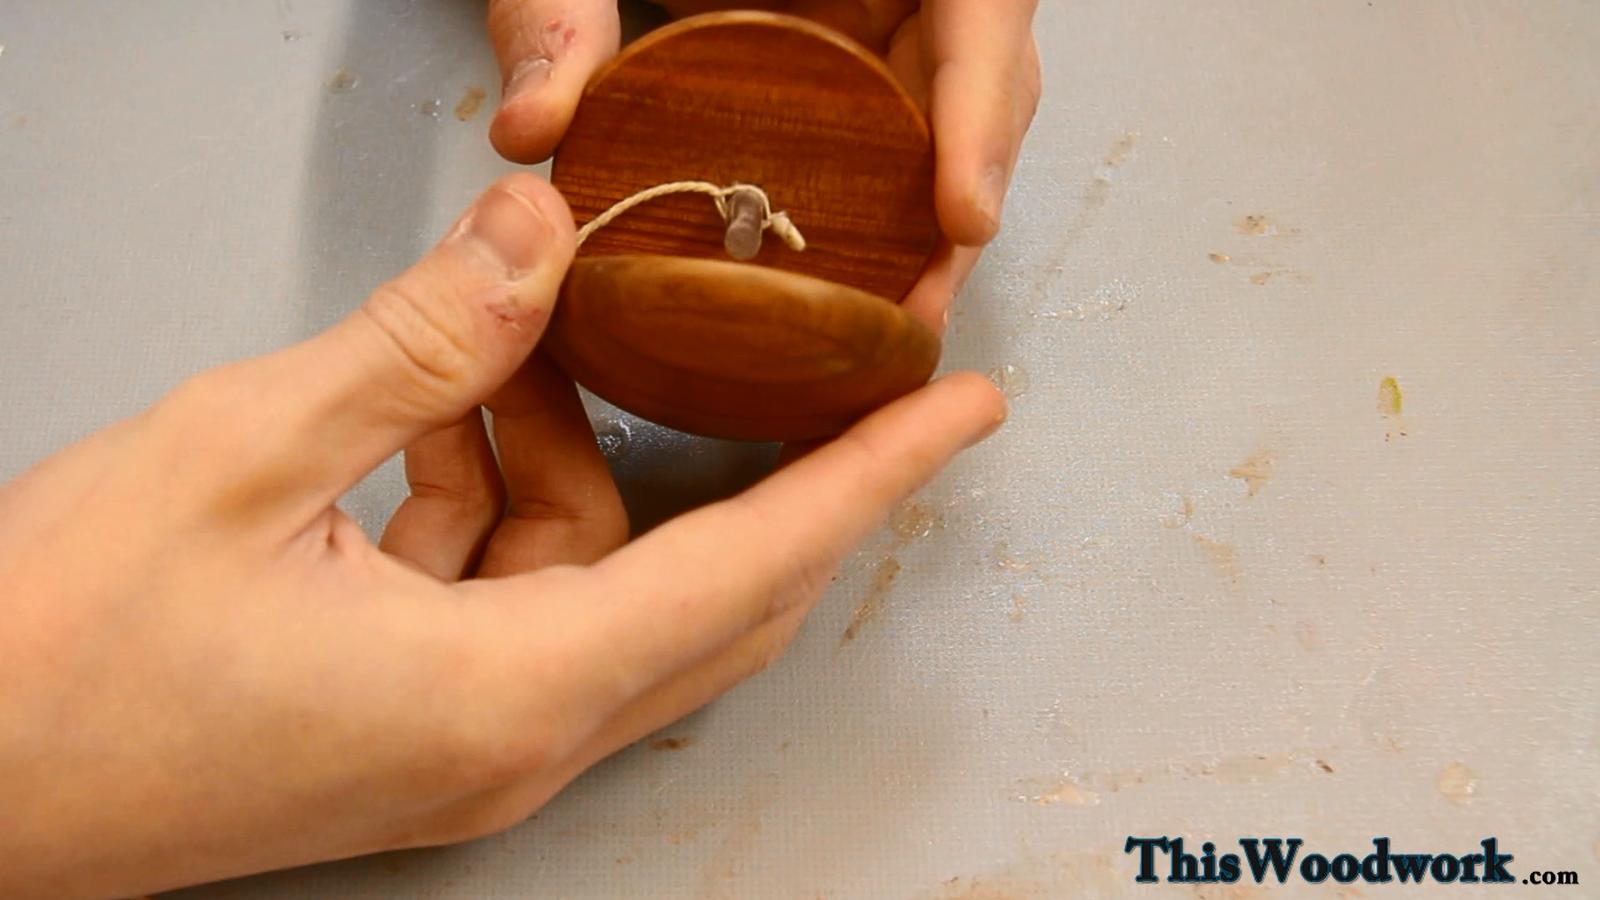 Wooden Yoyo Plans PDF Woodworking